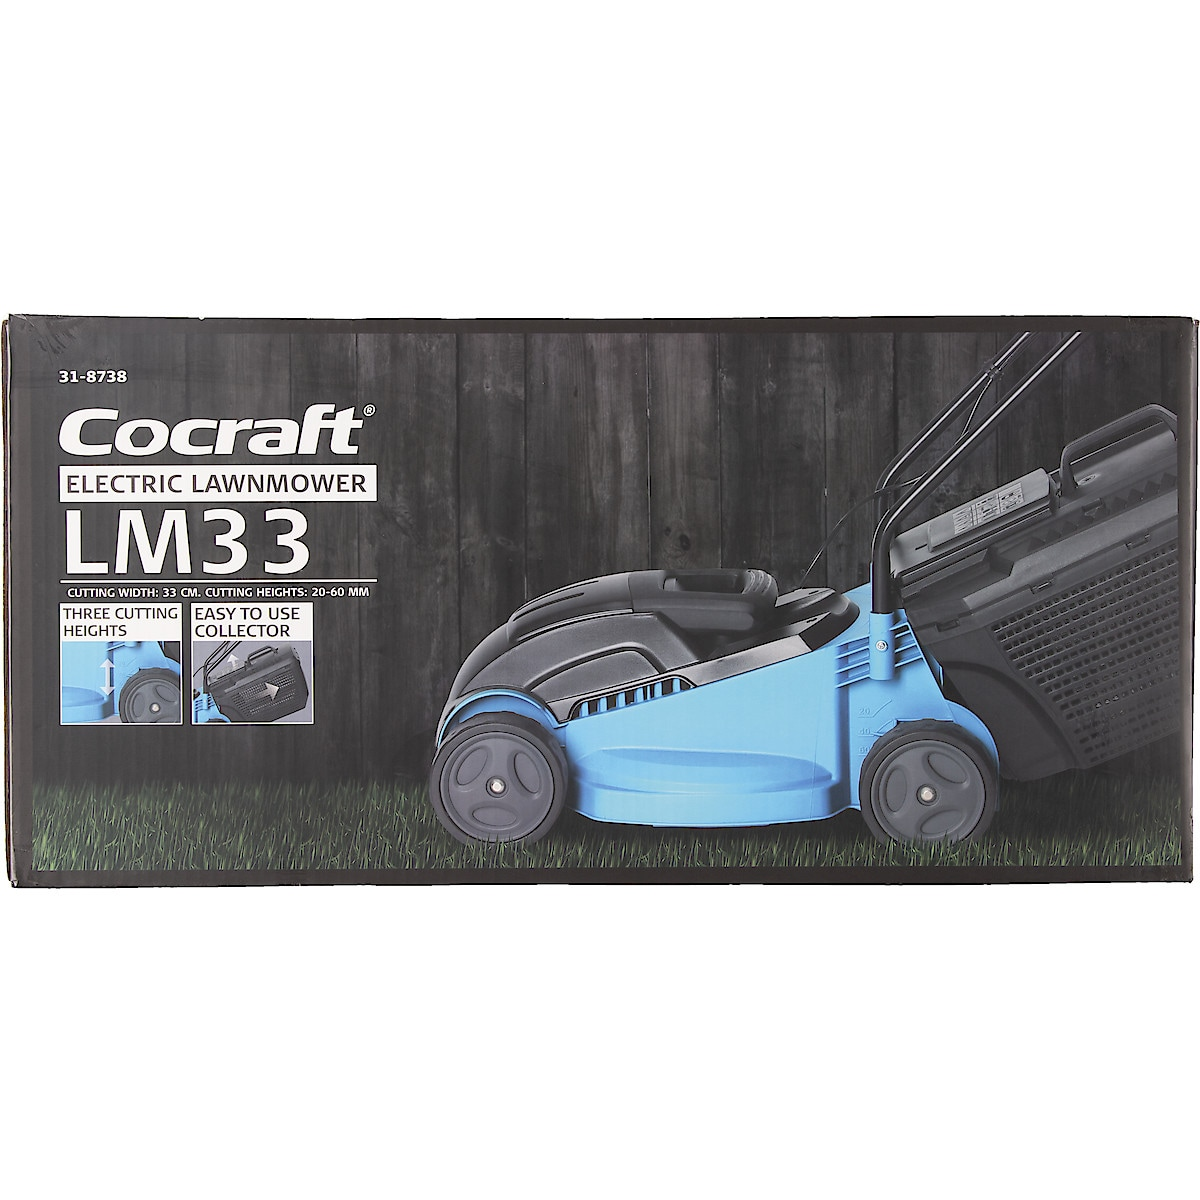 Elektrorasenmäher Cocraft LM33